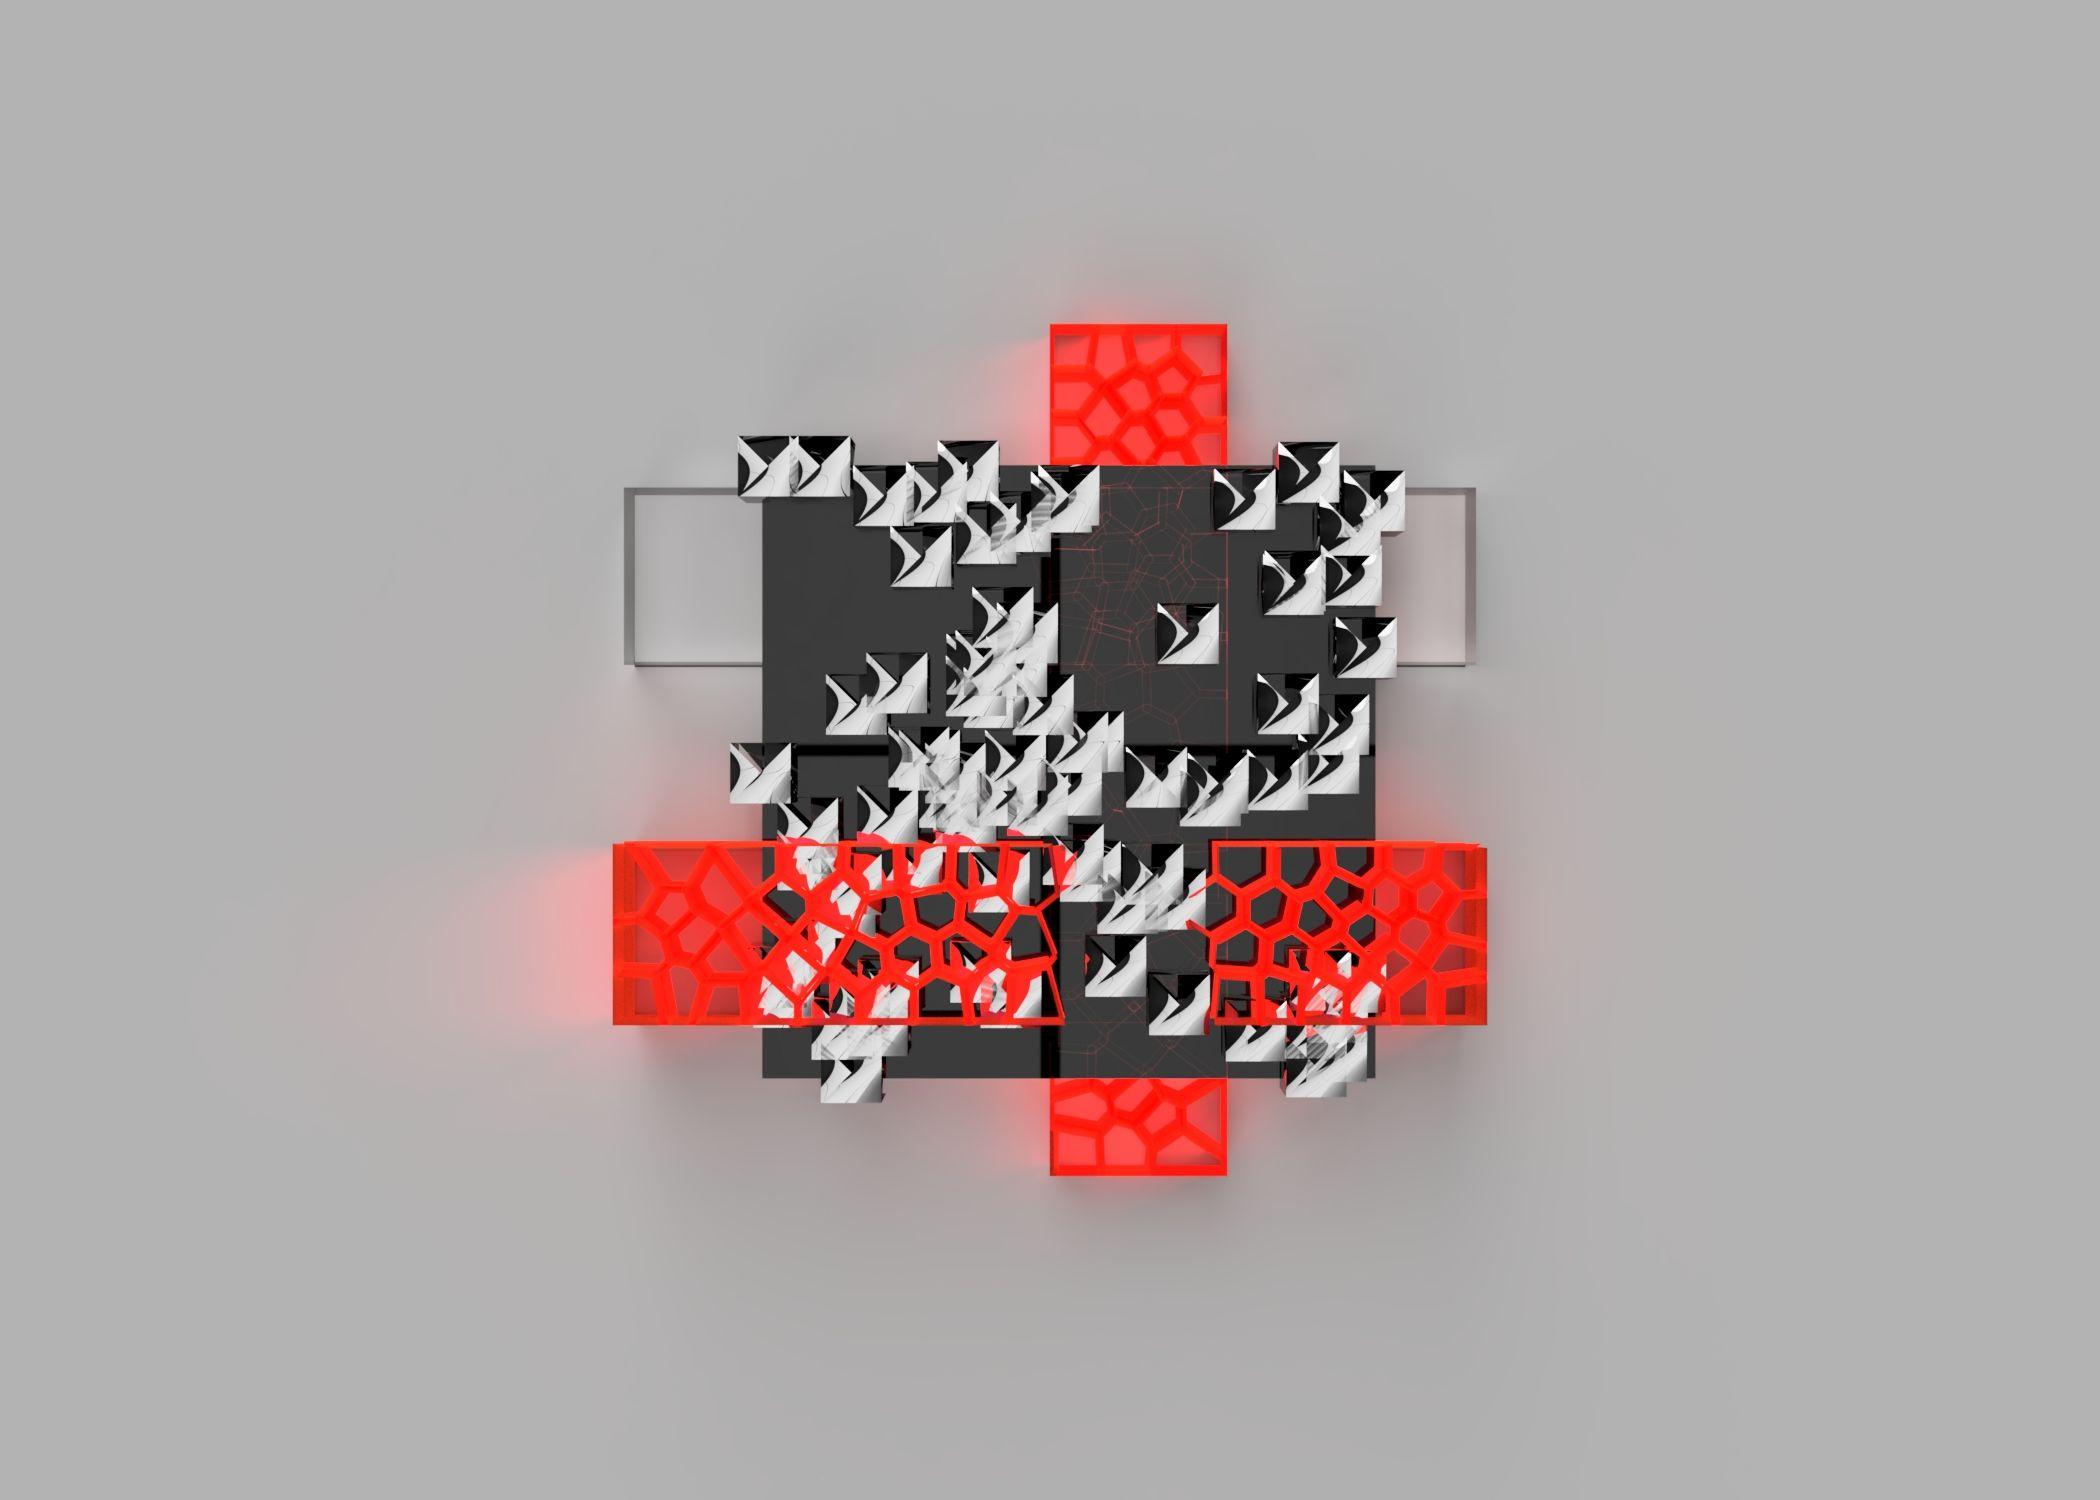 Raasrendering-0ab7c252-7ac9-48a8-8f4f-fb60d85357eb-3500-3500